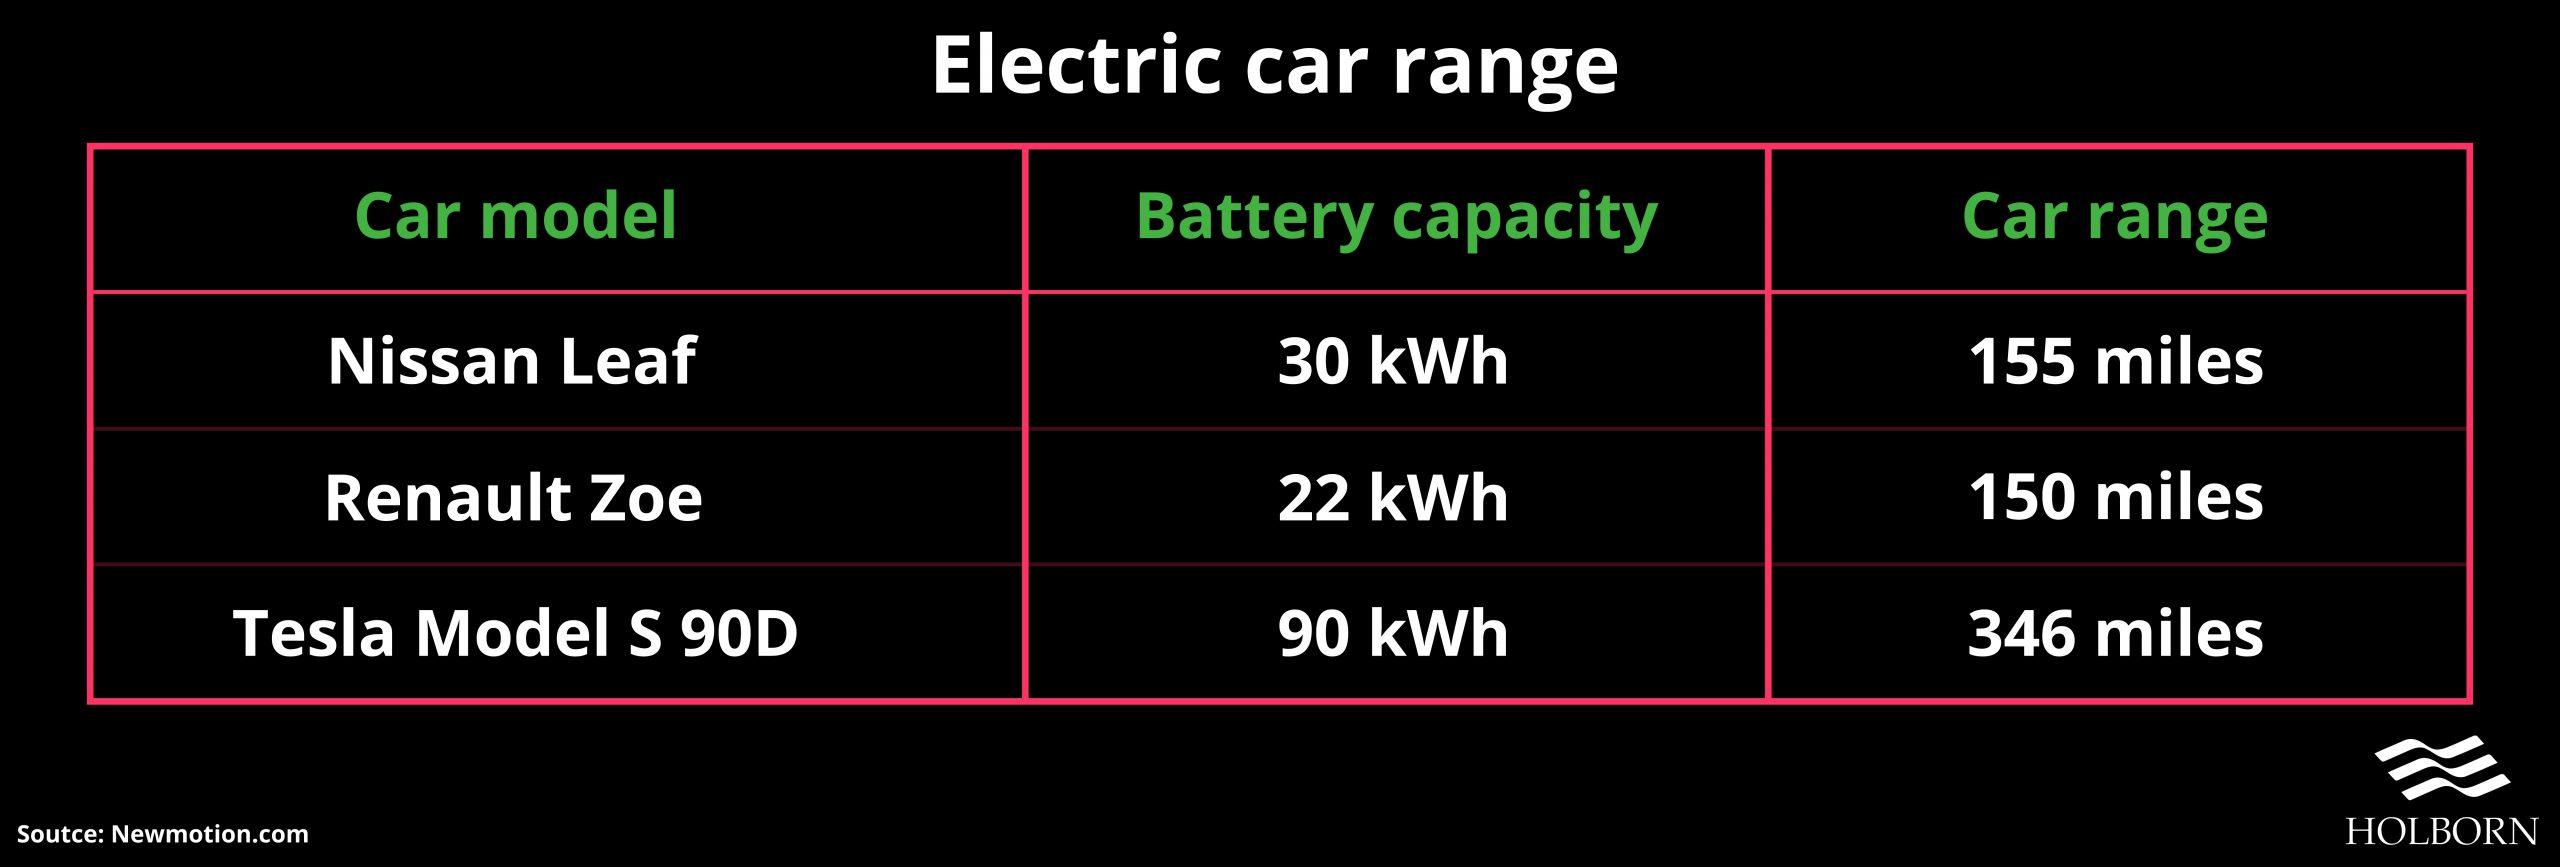 Electric car range